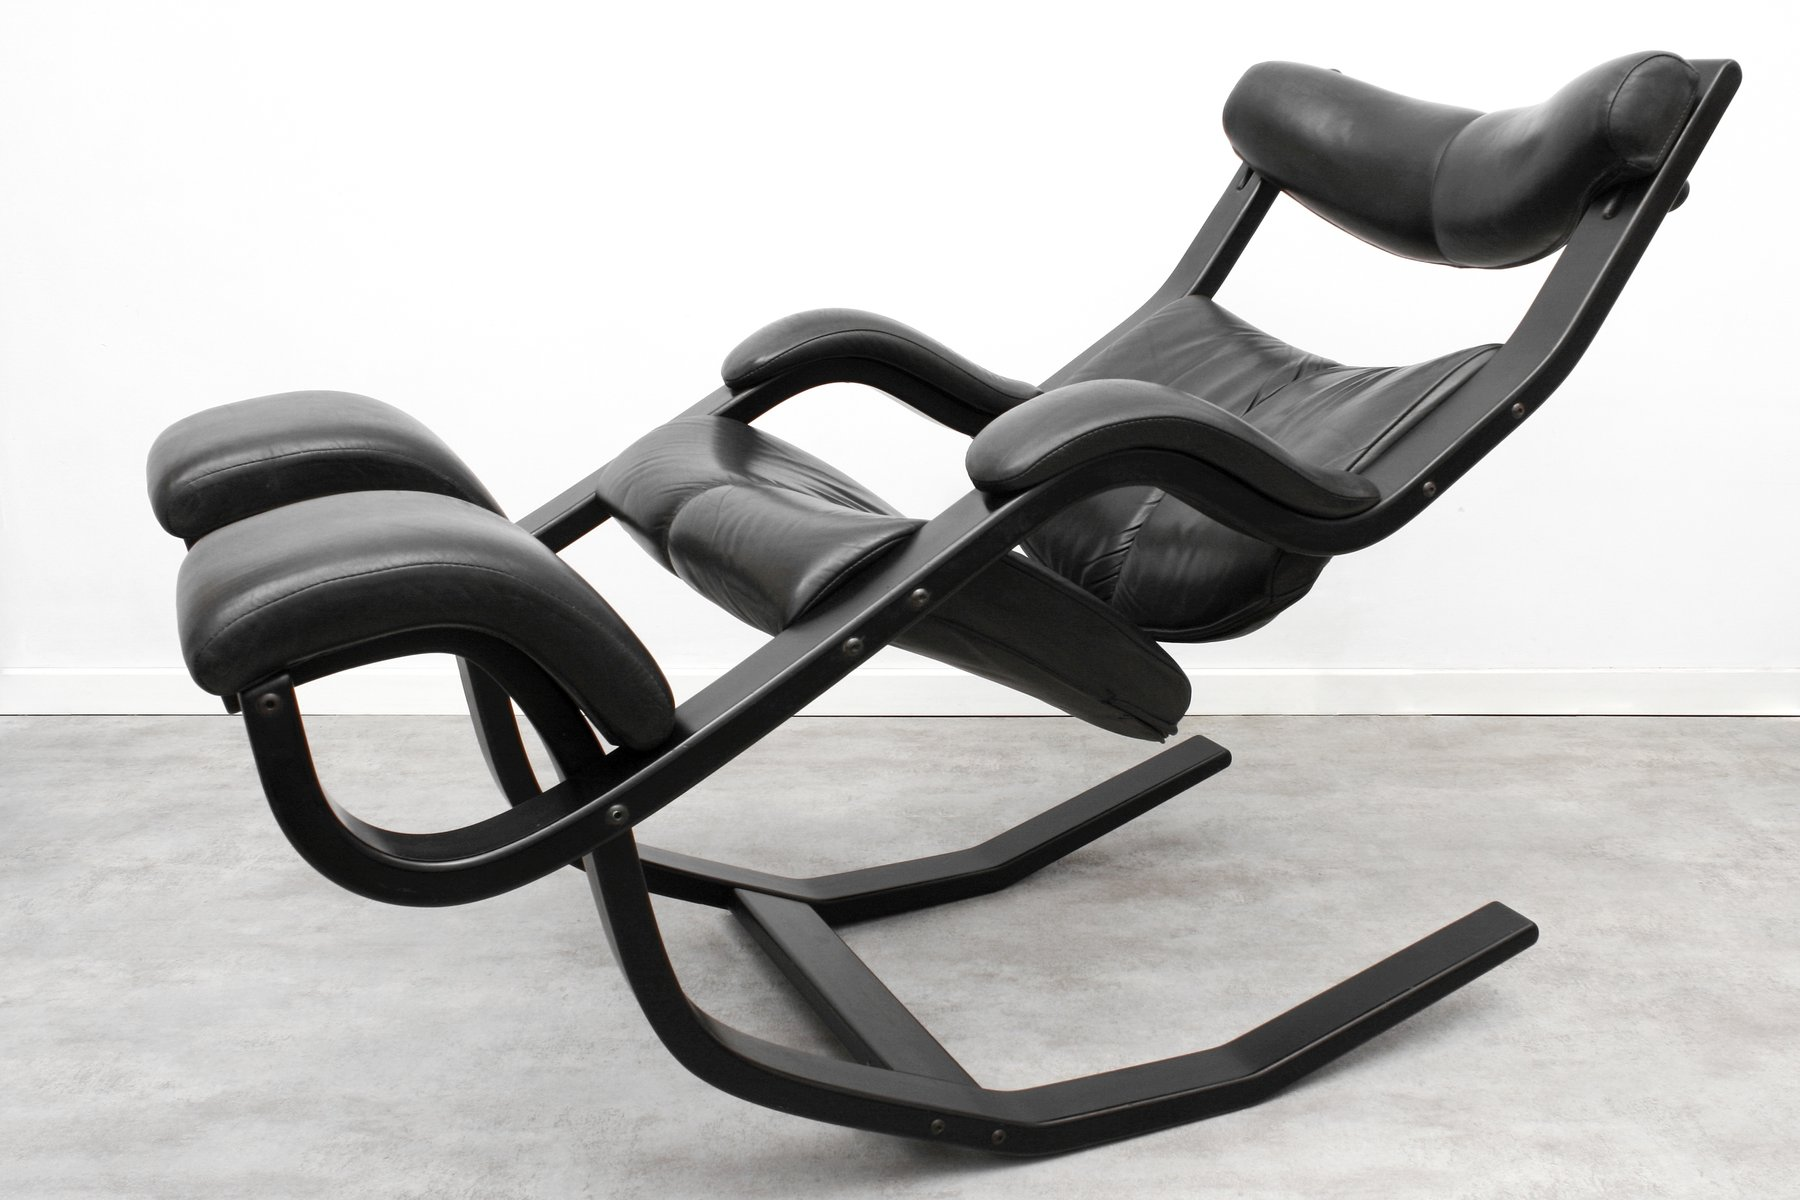 Sedia ergonomica per ufficio stokke sedia ergonomica stokke